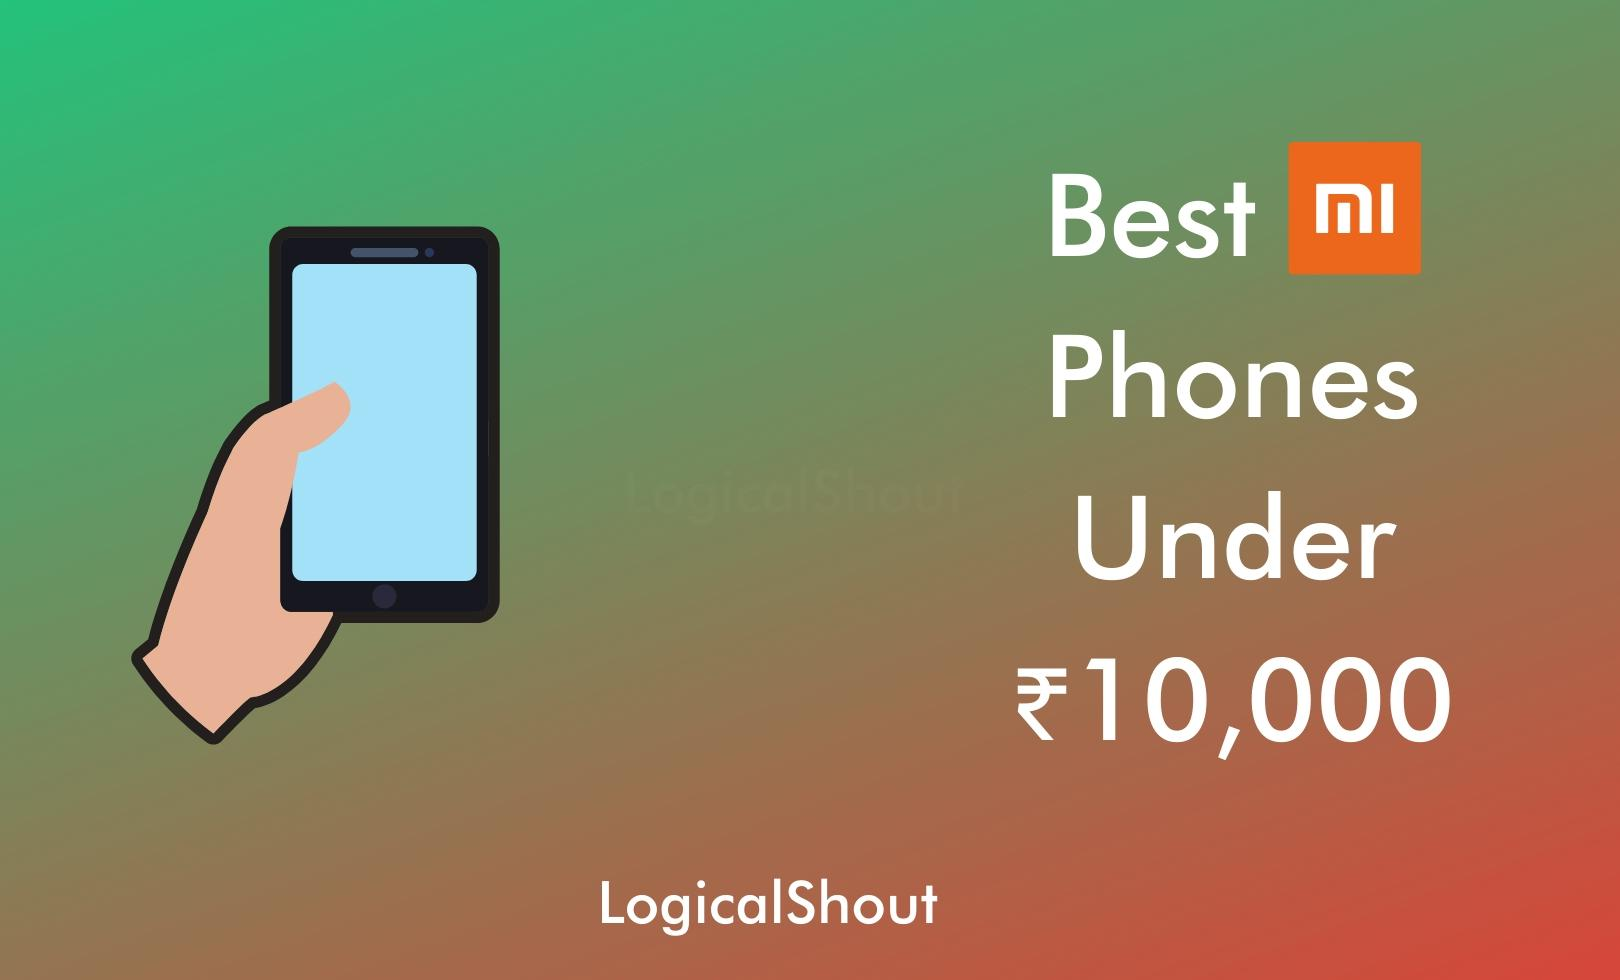 Best Mi Phones Under 10000